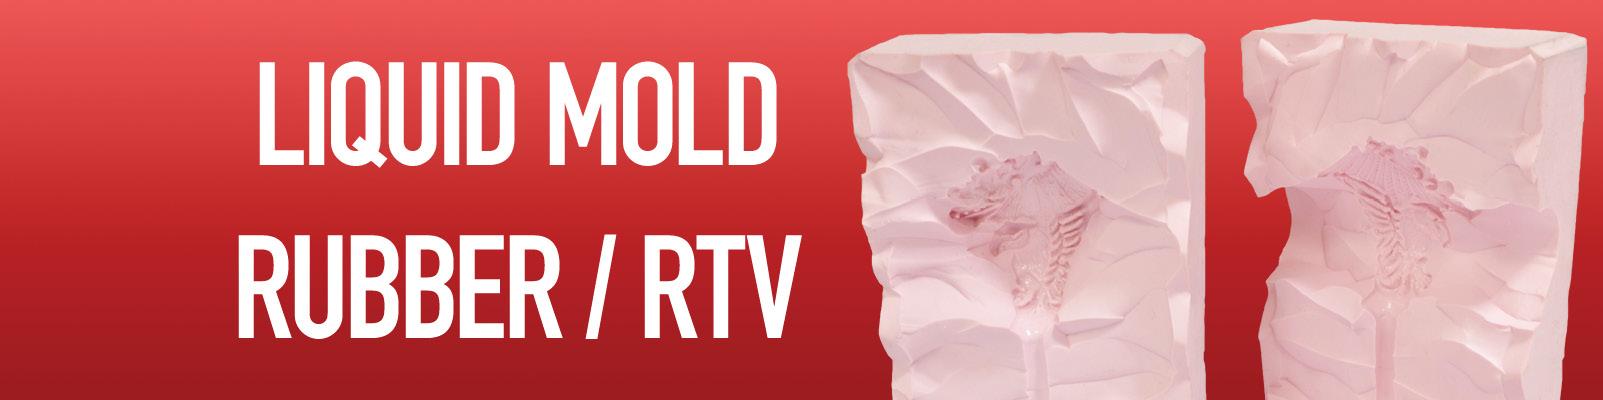 Liquid Mold Rubber / RTV